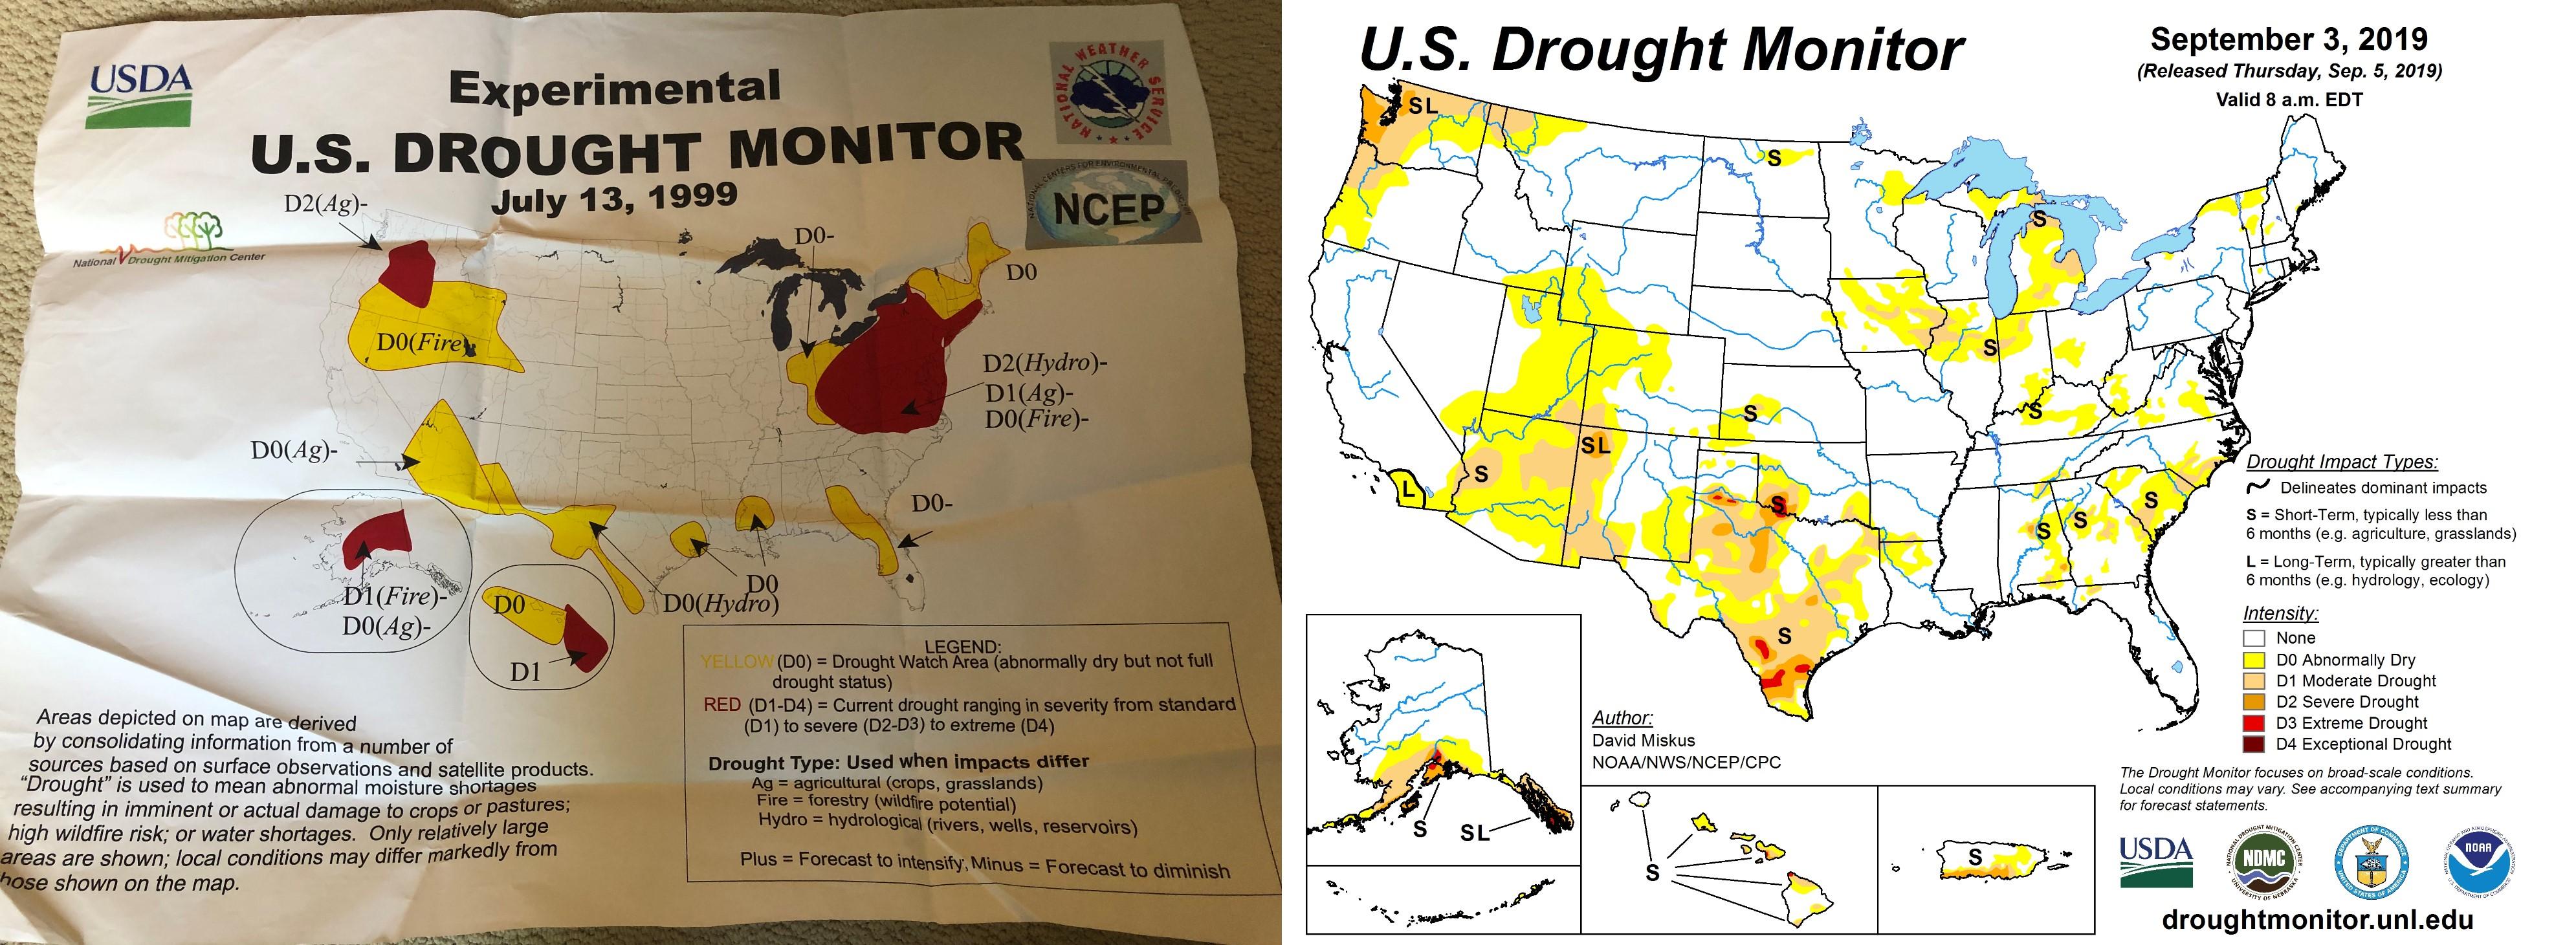 U.S. Drought Monitor celebrates its 20th year